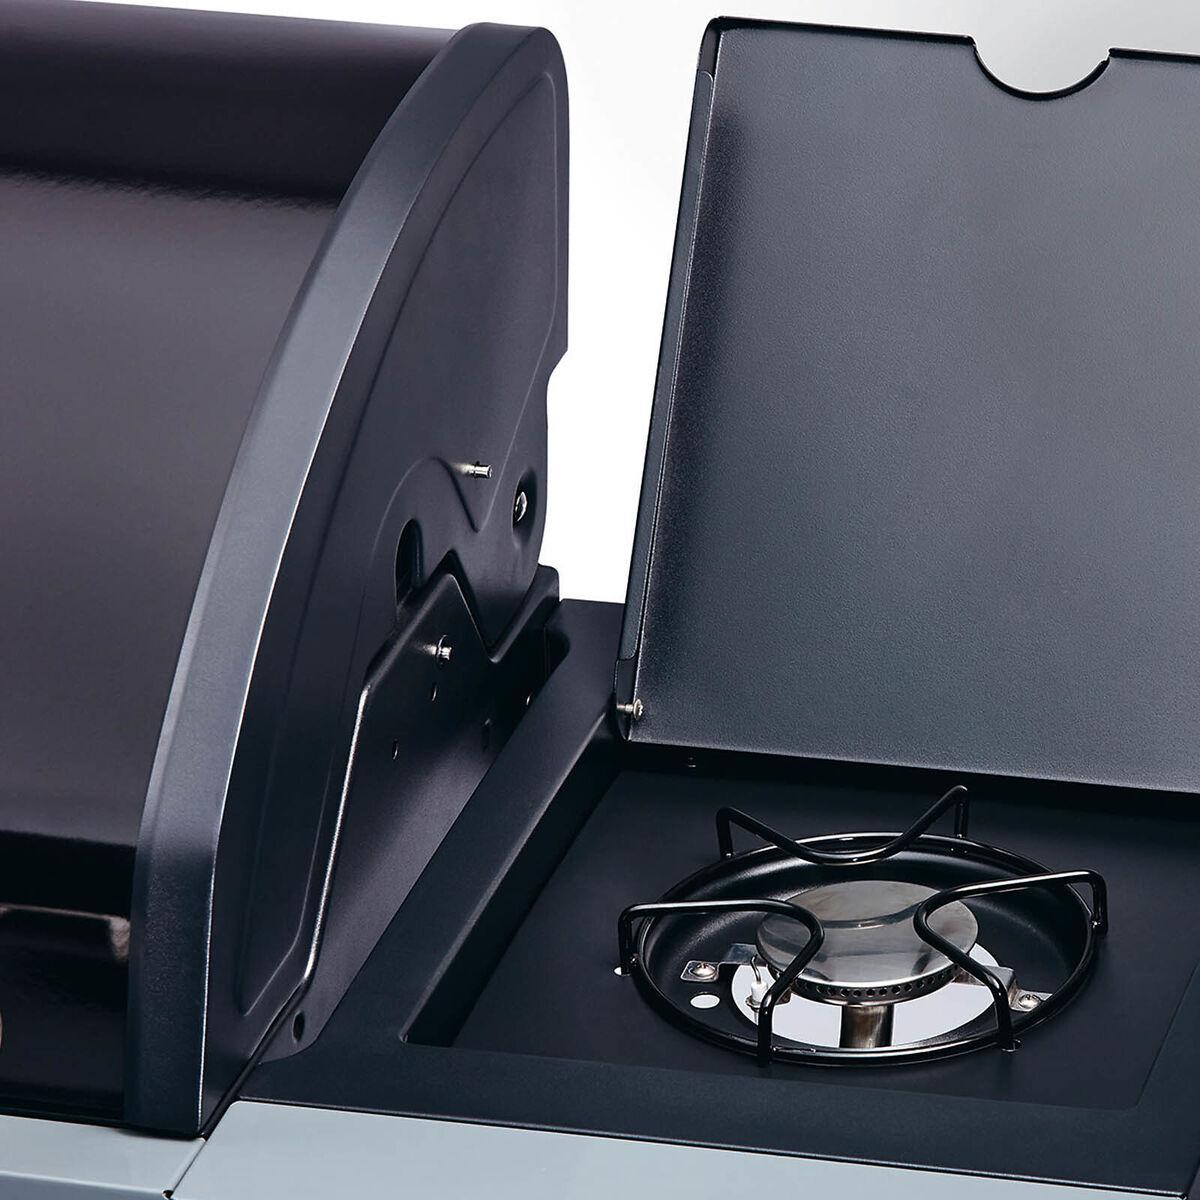 Bild 5 von Enders Gasgrill 4-Brenner Boston Black 4 IK Turbo, 61x144x115cm, schwarz